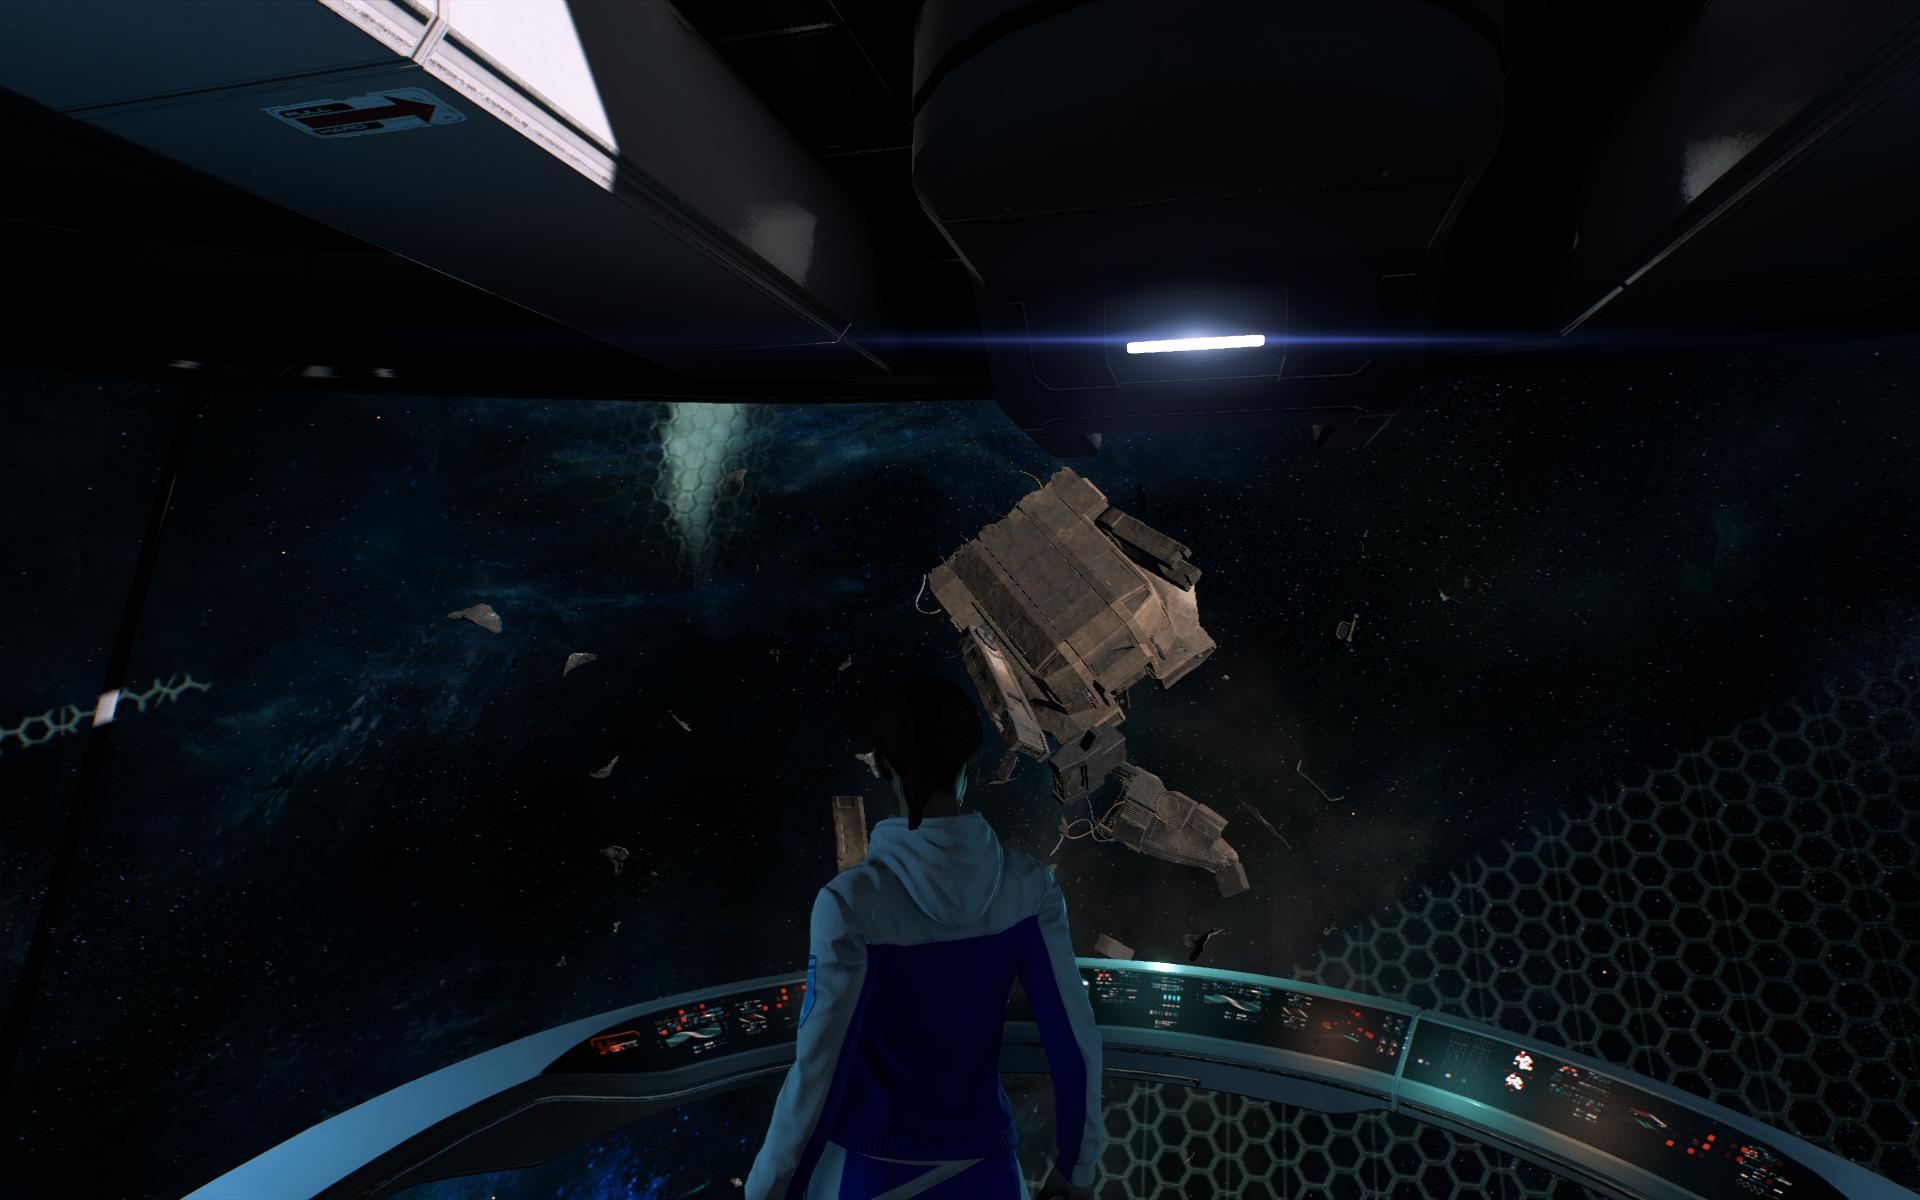 Mass Effect Andromeda Screenshot  - 12.29.52.94.png - Mass Effect: Andromeda